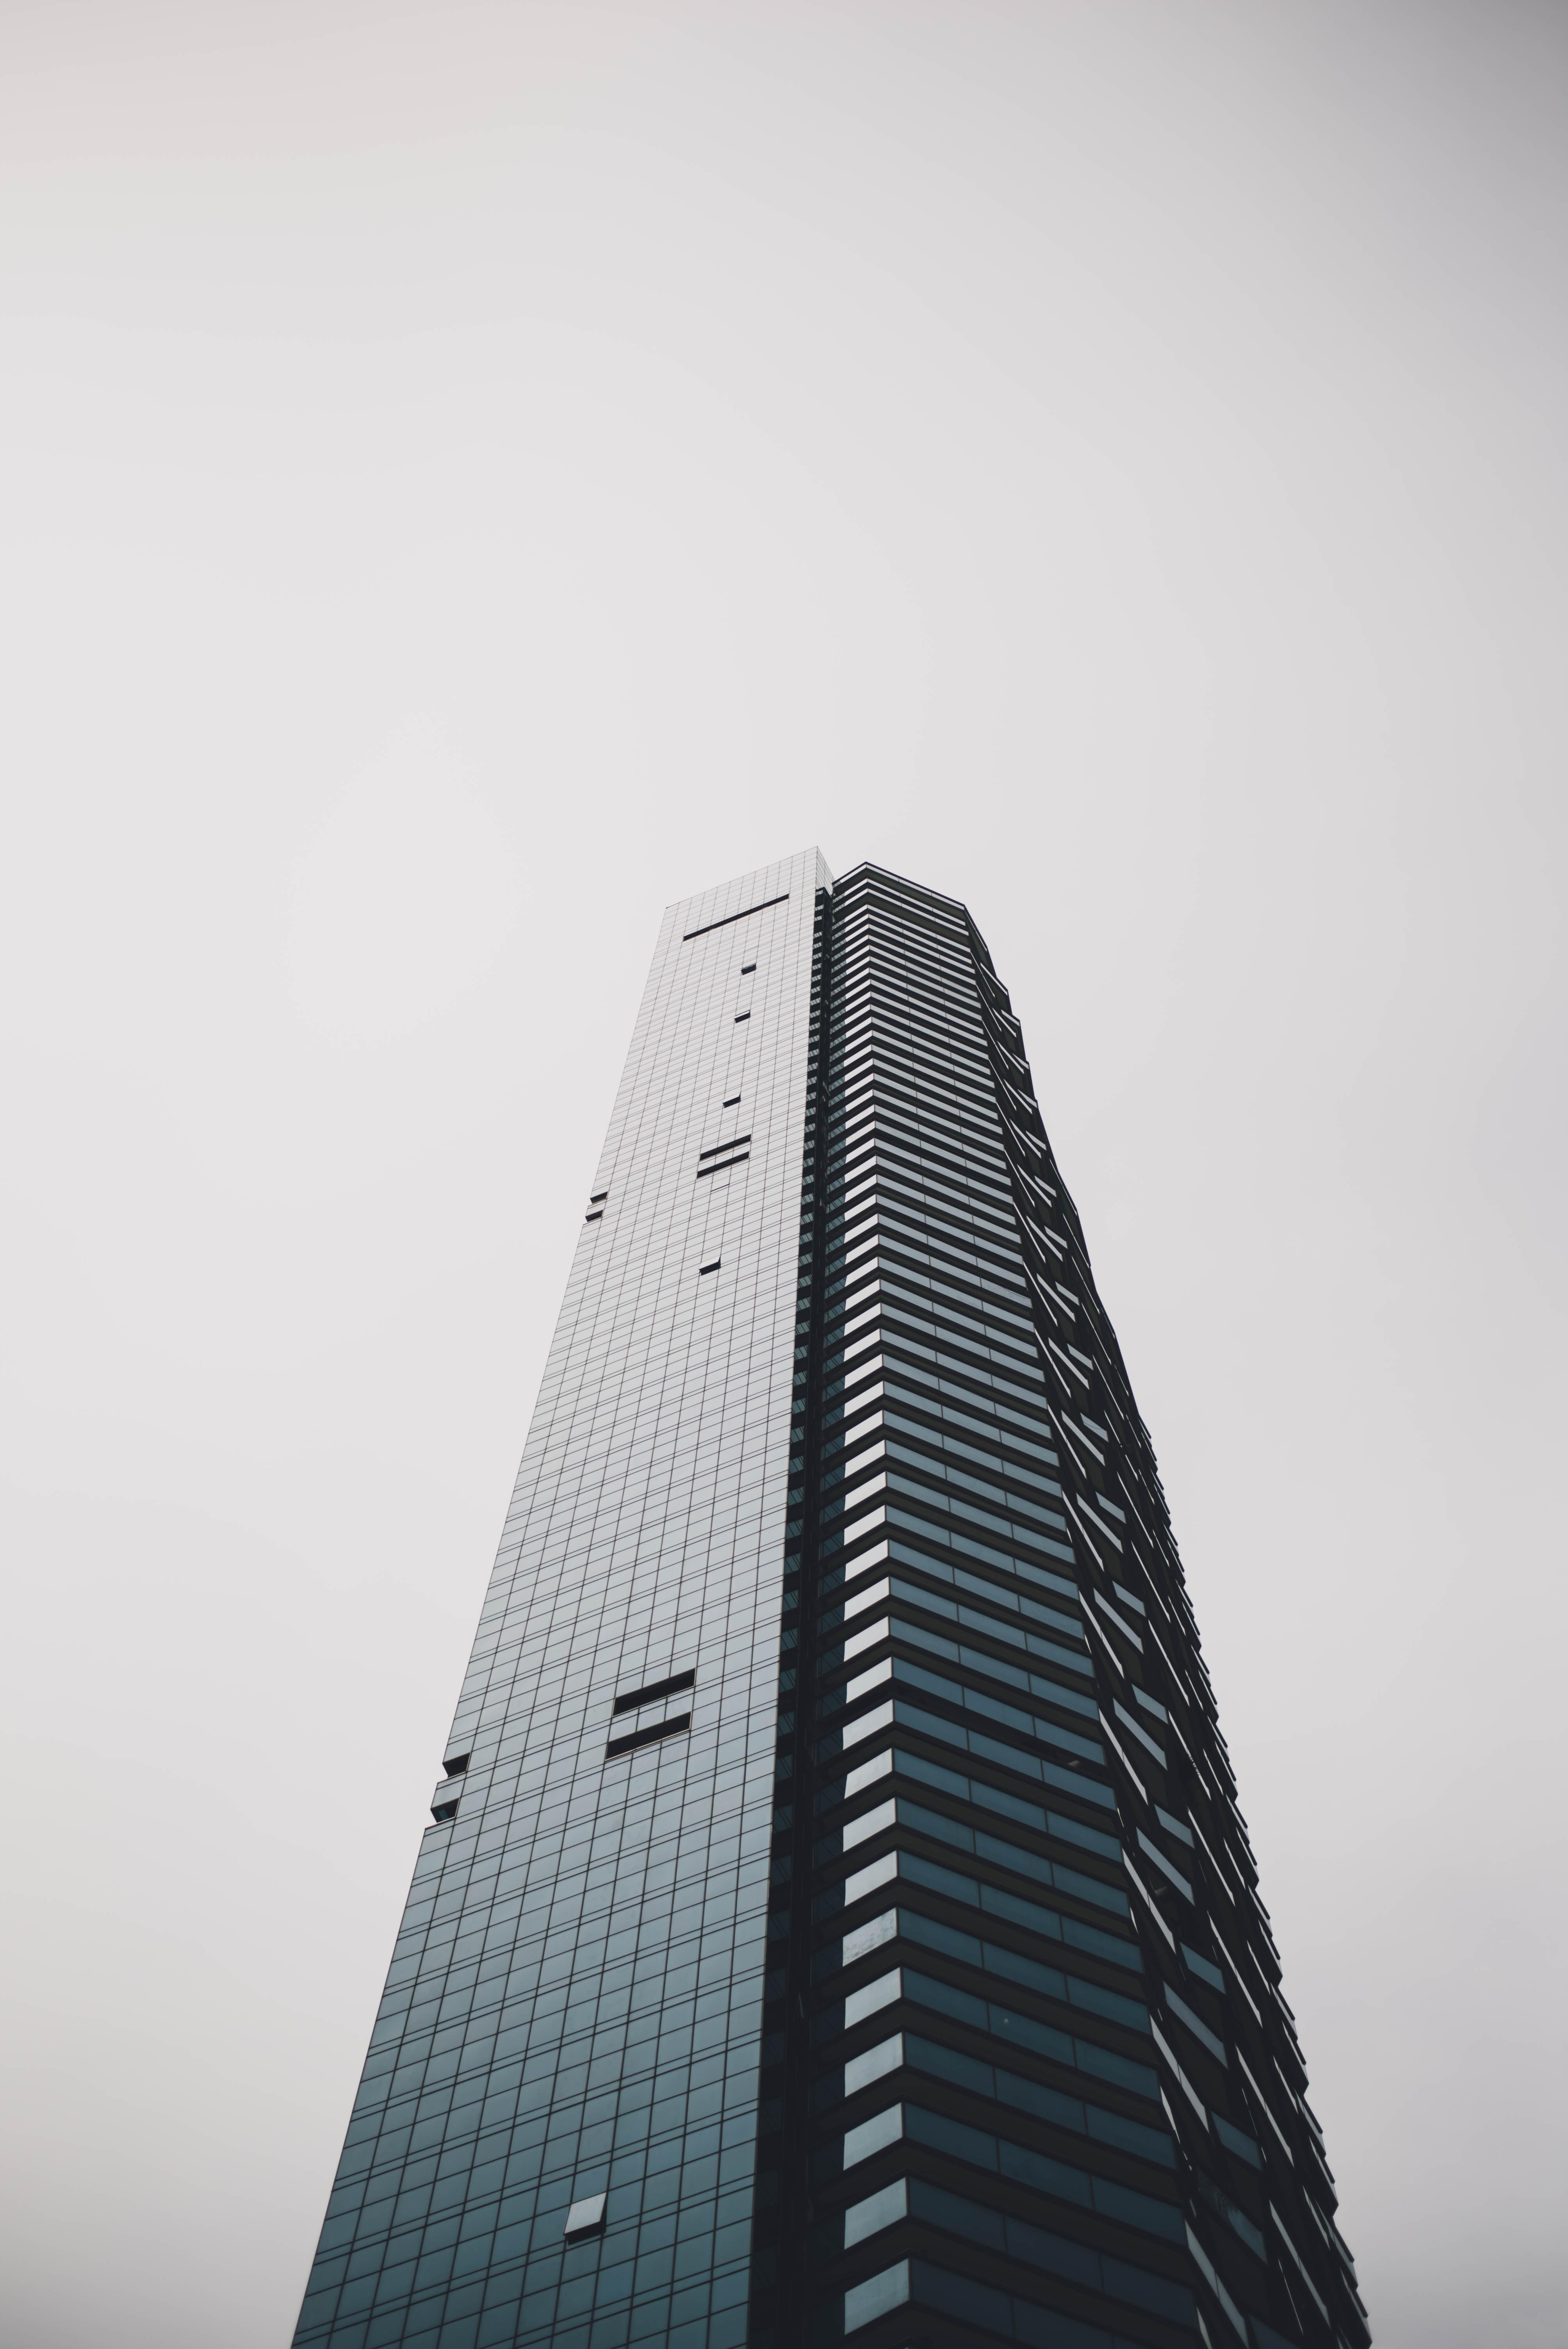 A tall skyscraper with a black glass facade